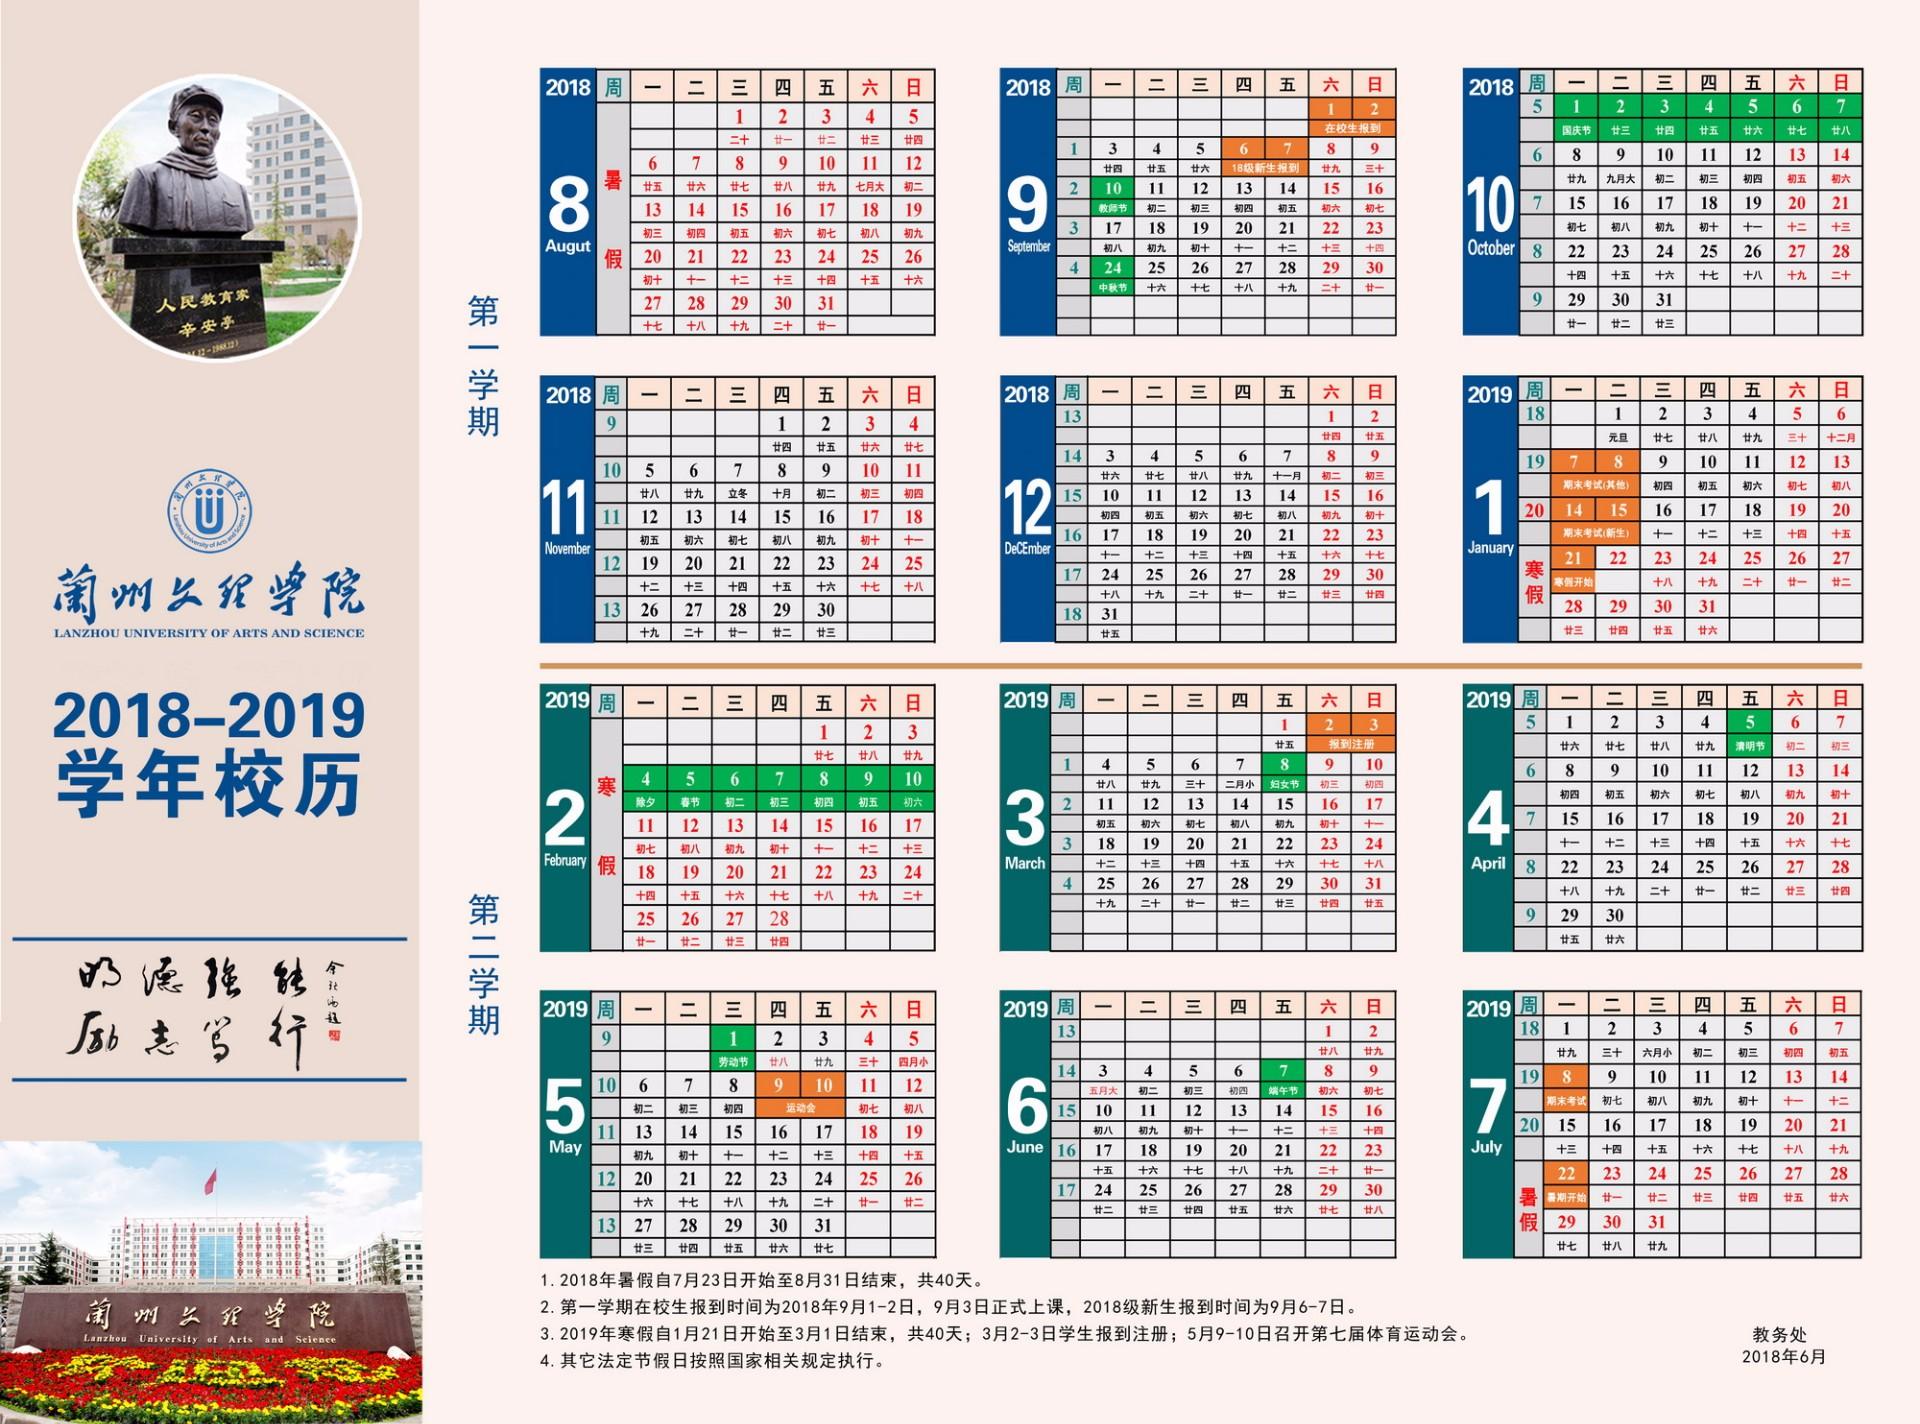 lan州诚xin在线平台学院校历(2018-2019学年).jpg